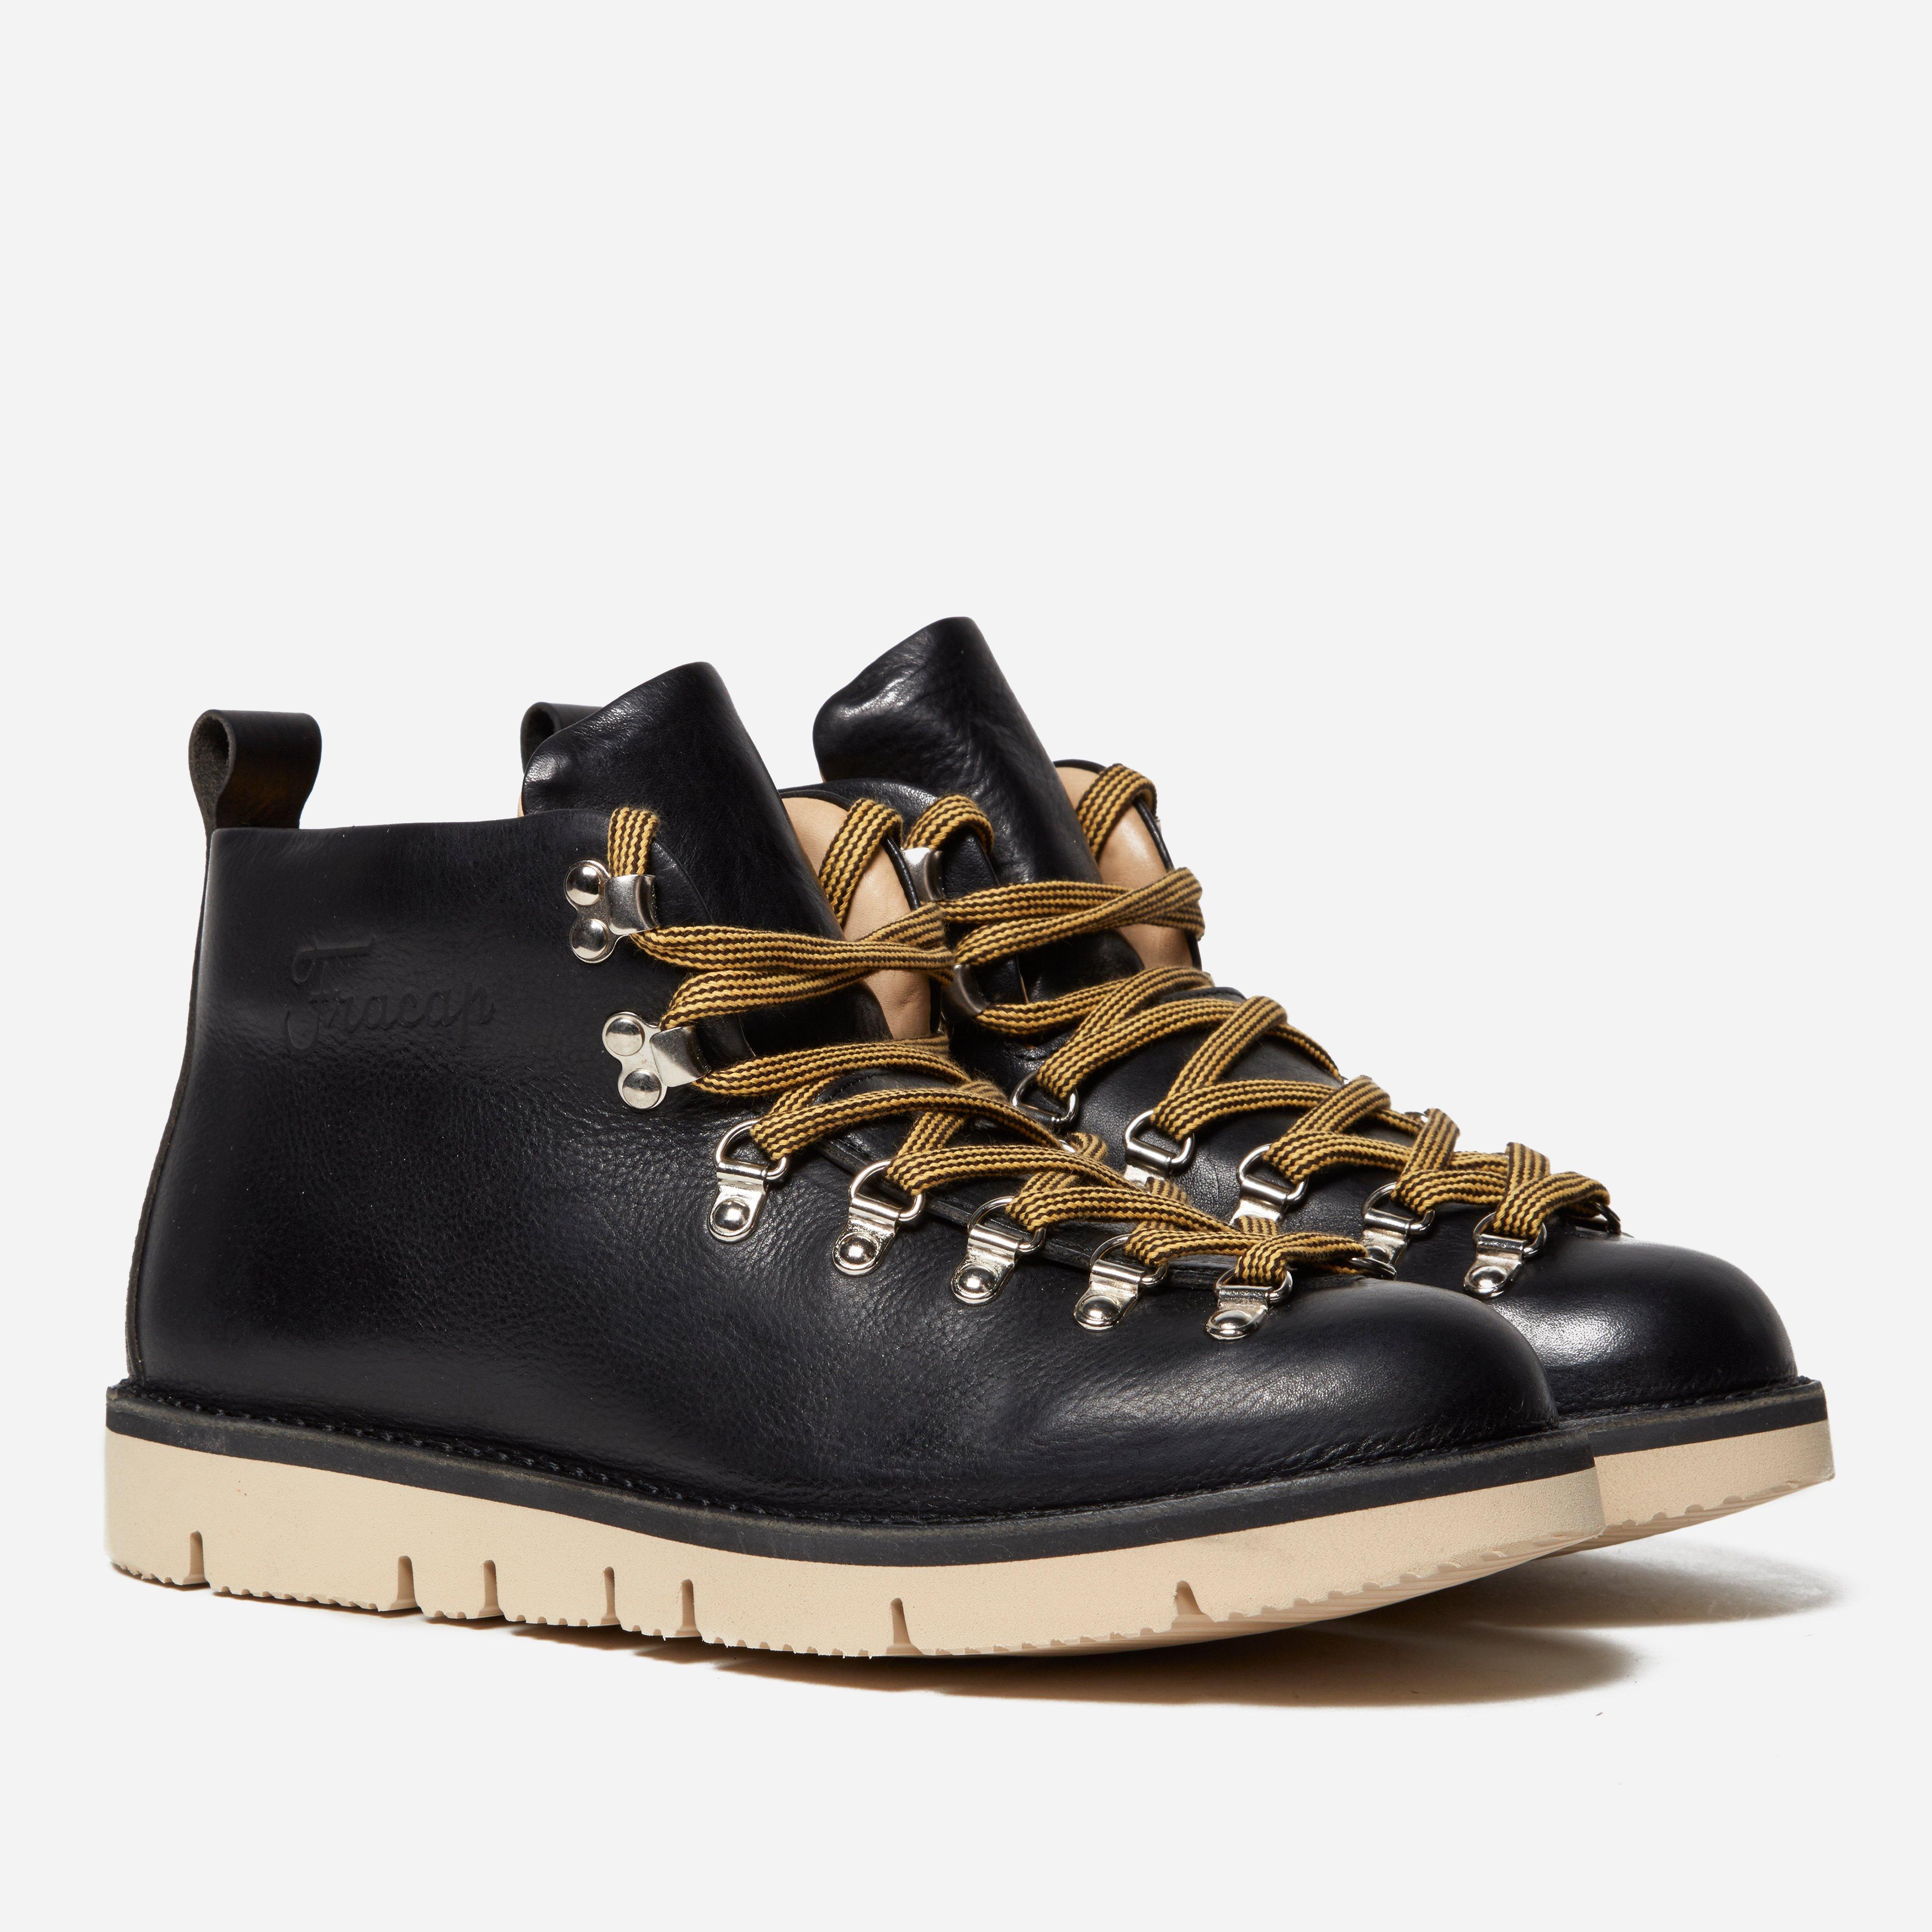 Fracap M120 Suola Vibram Scarponcino Boot